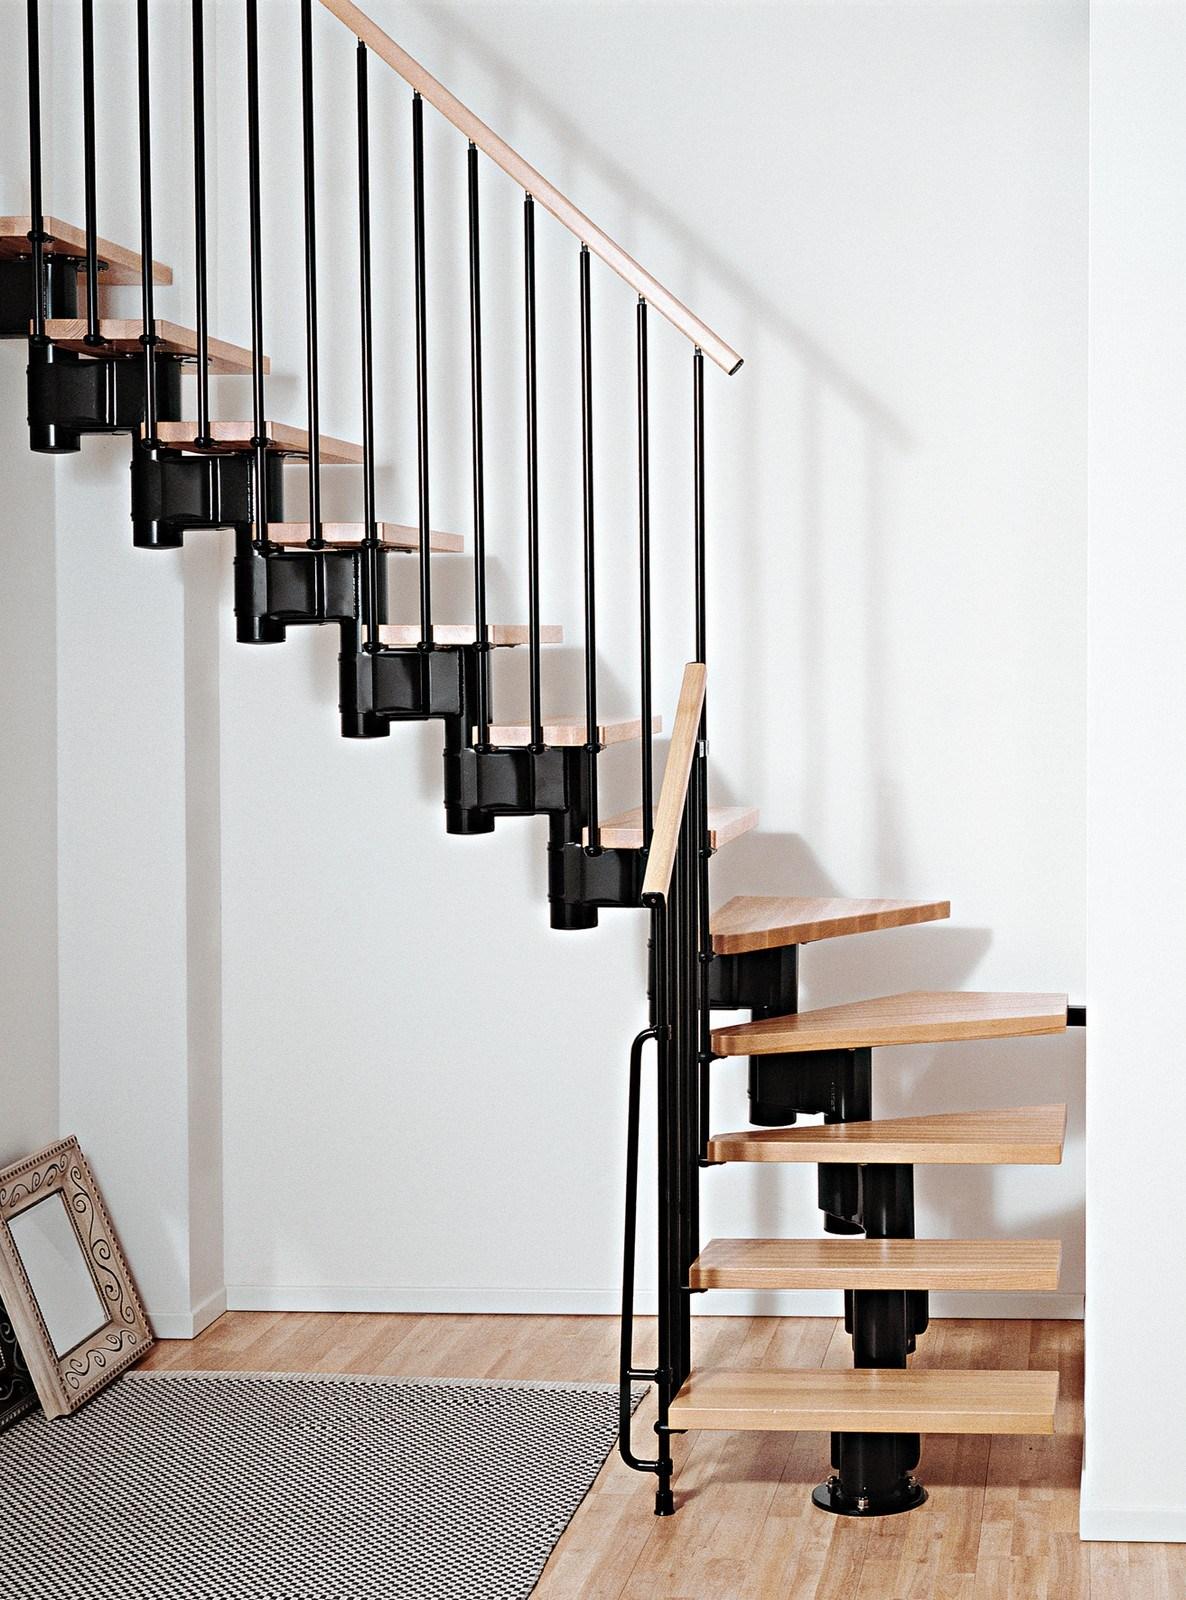 Kompact Adjustable Staircase Kit Metal Steel And Wood Spiral | Semi Spiral Staircase Design | Handrail | Inside | Semi Circular | Elegant | Residential Library